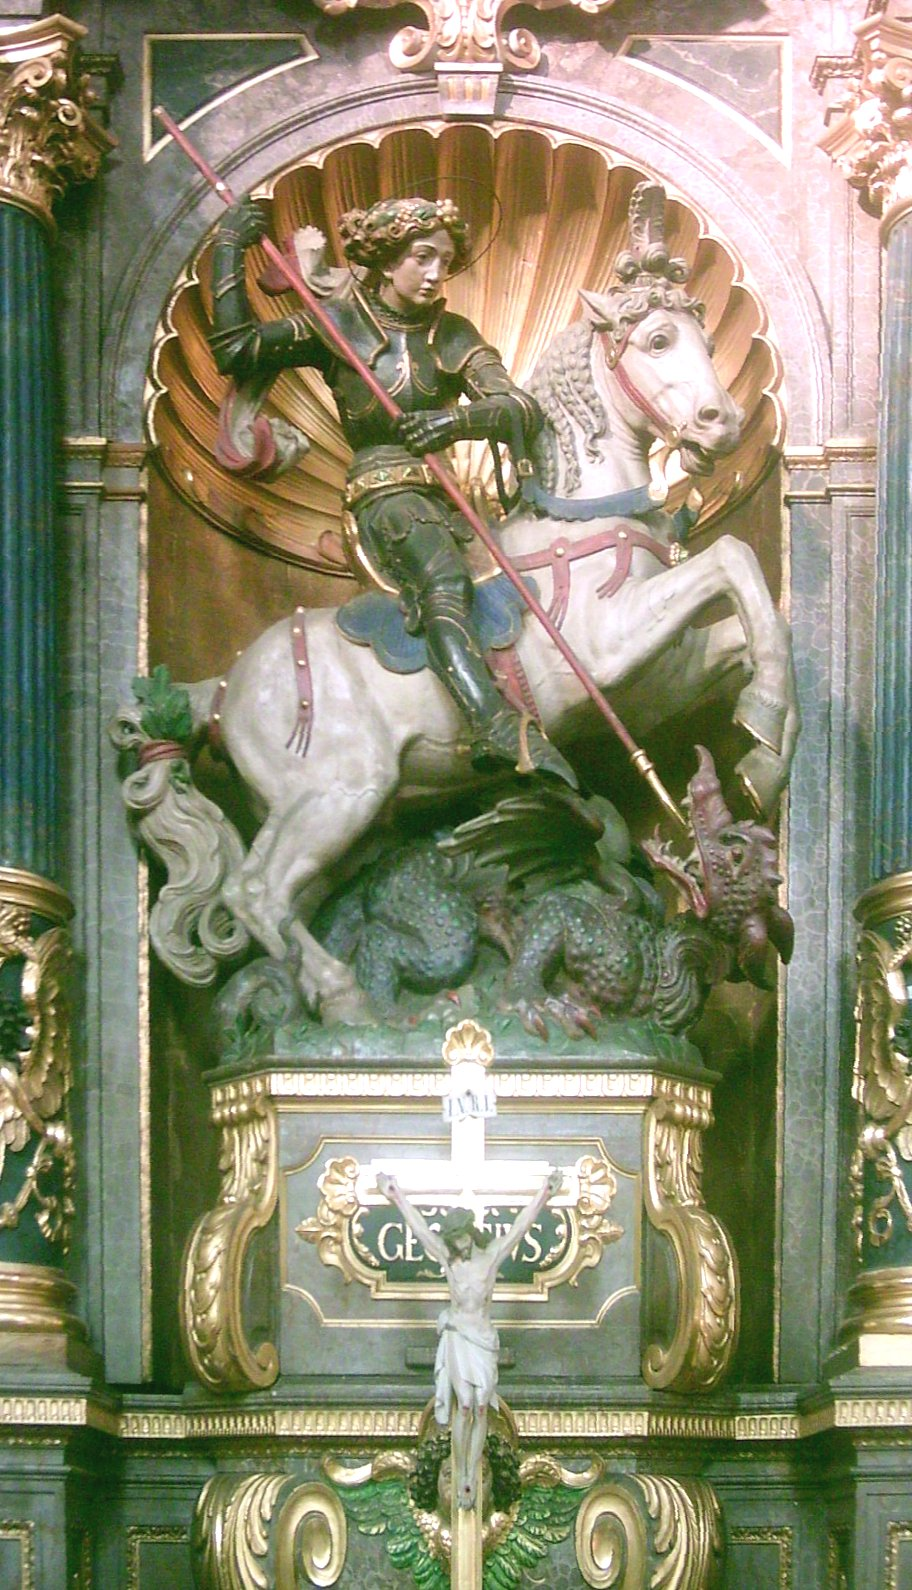 St. Georg, Maragaretenkirche München, 16. Jhdt.